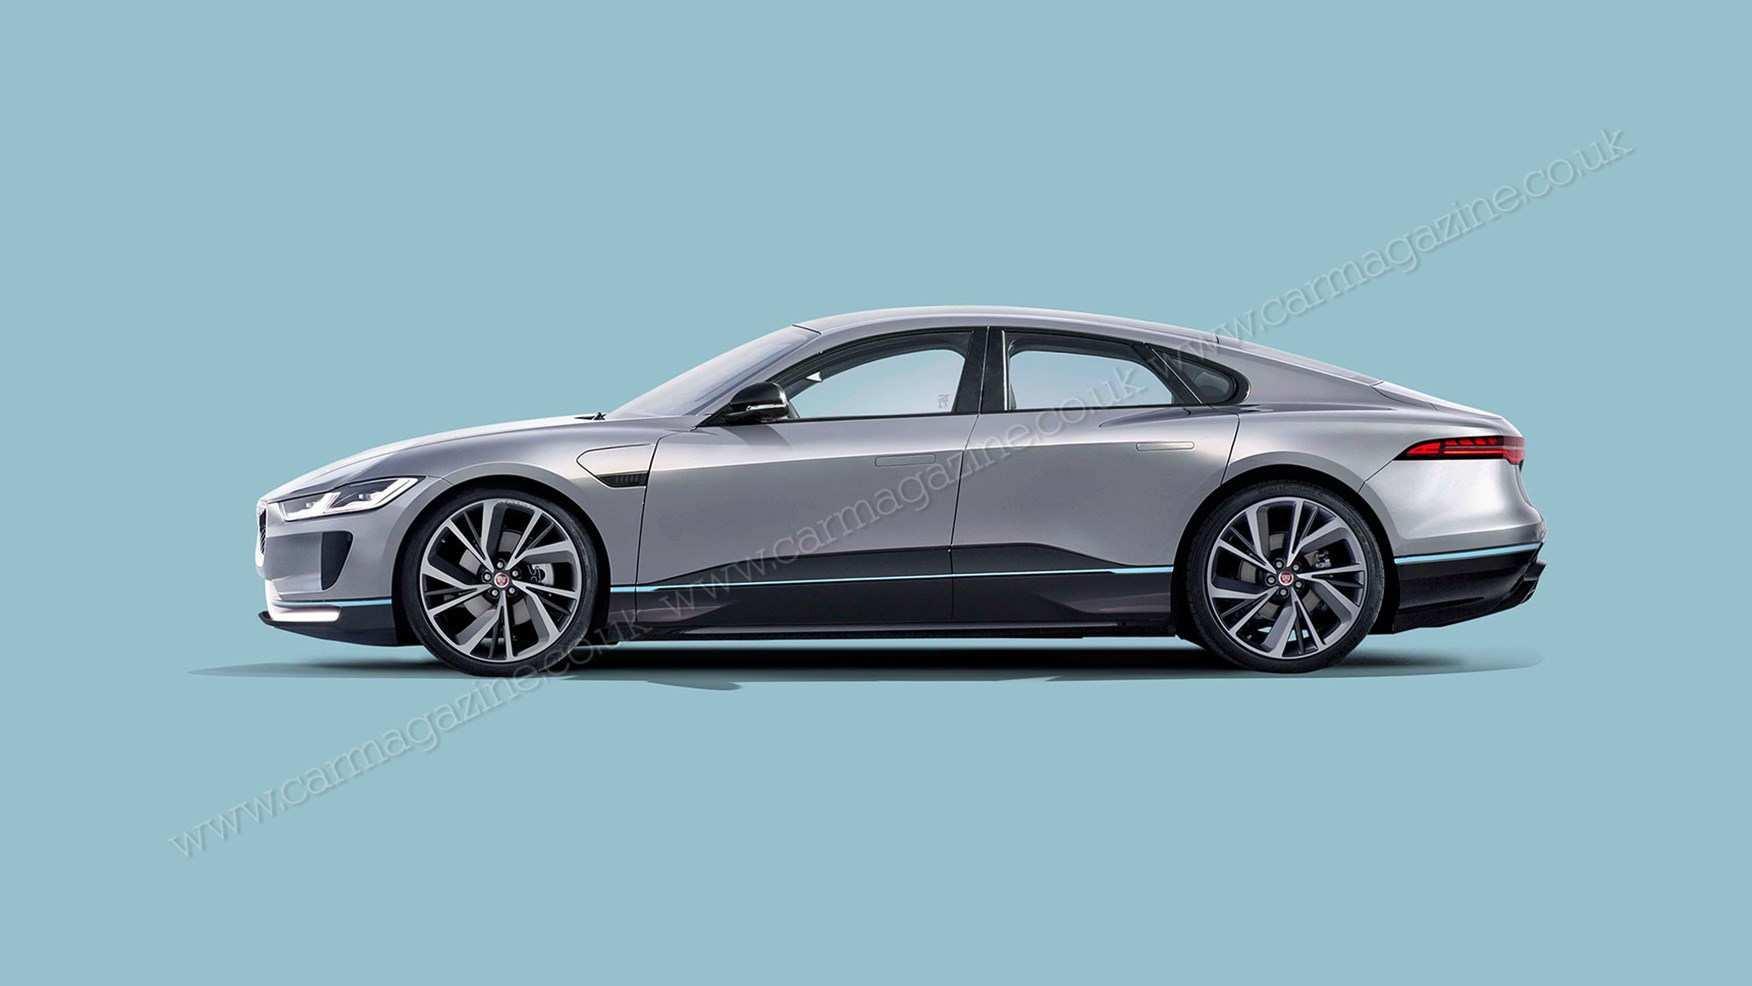 14 The Best 2019 Jaguar Xj Hybrid Spesification Performance for Best 2019 Jaguar Xj Hybrid Spesification